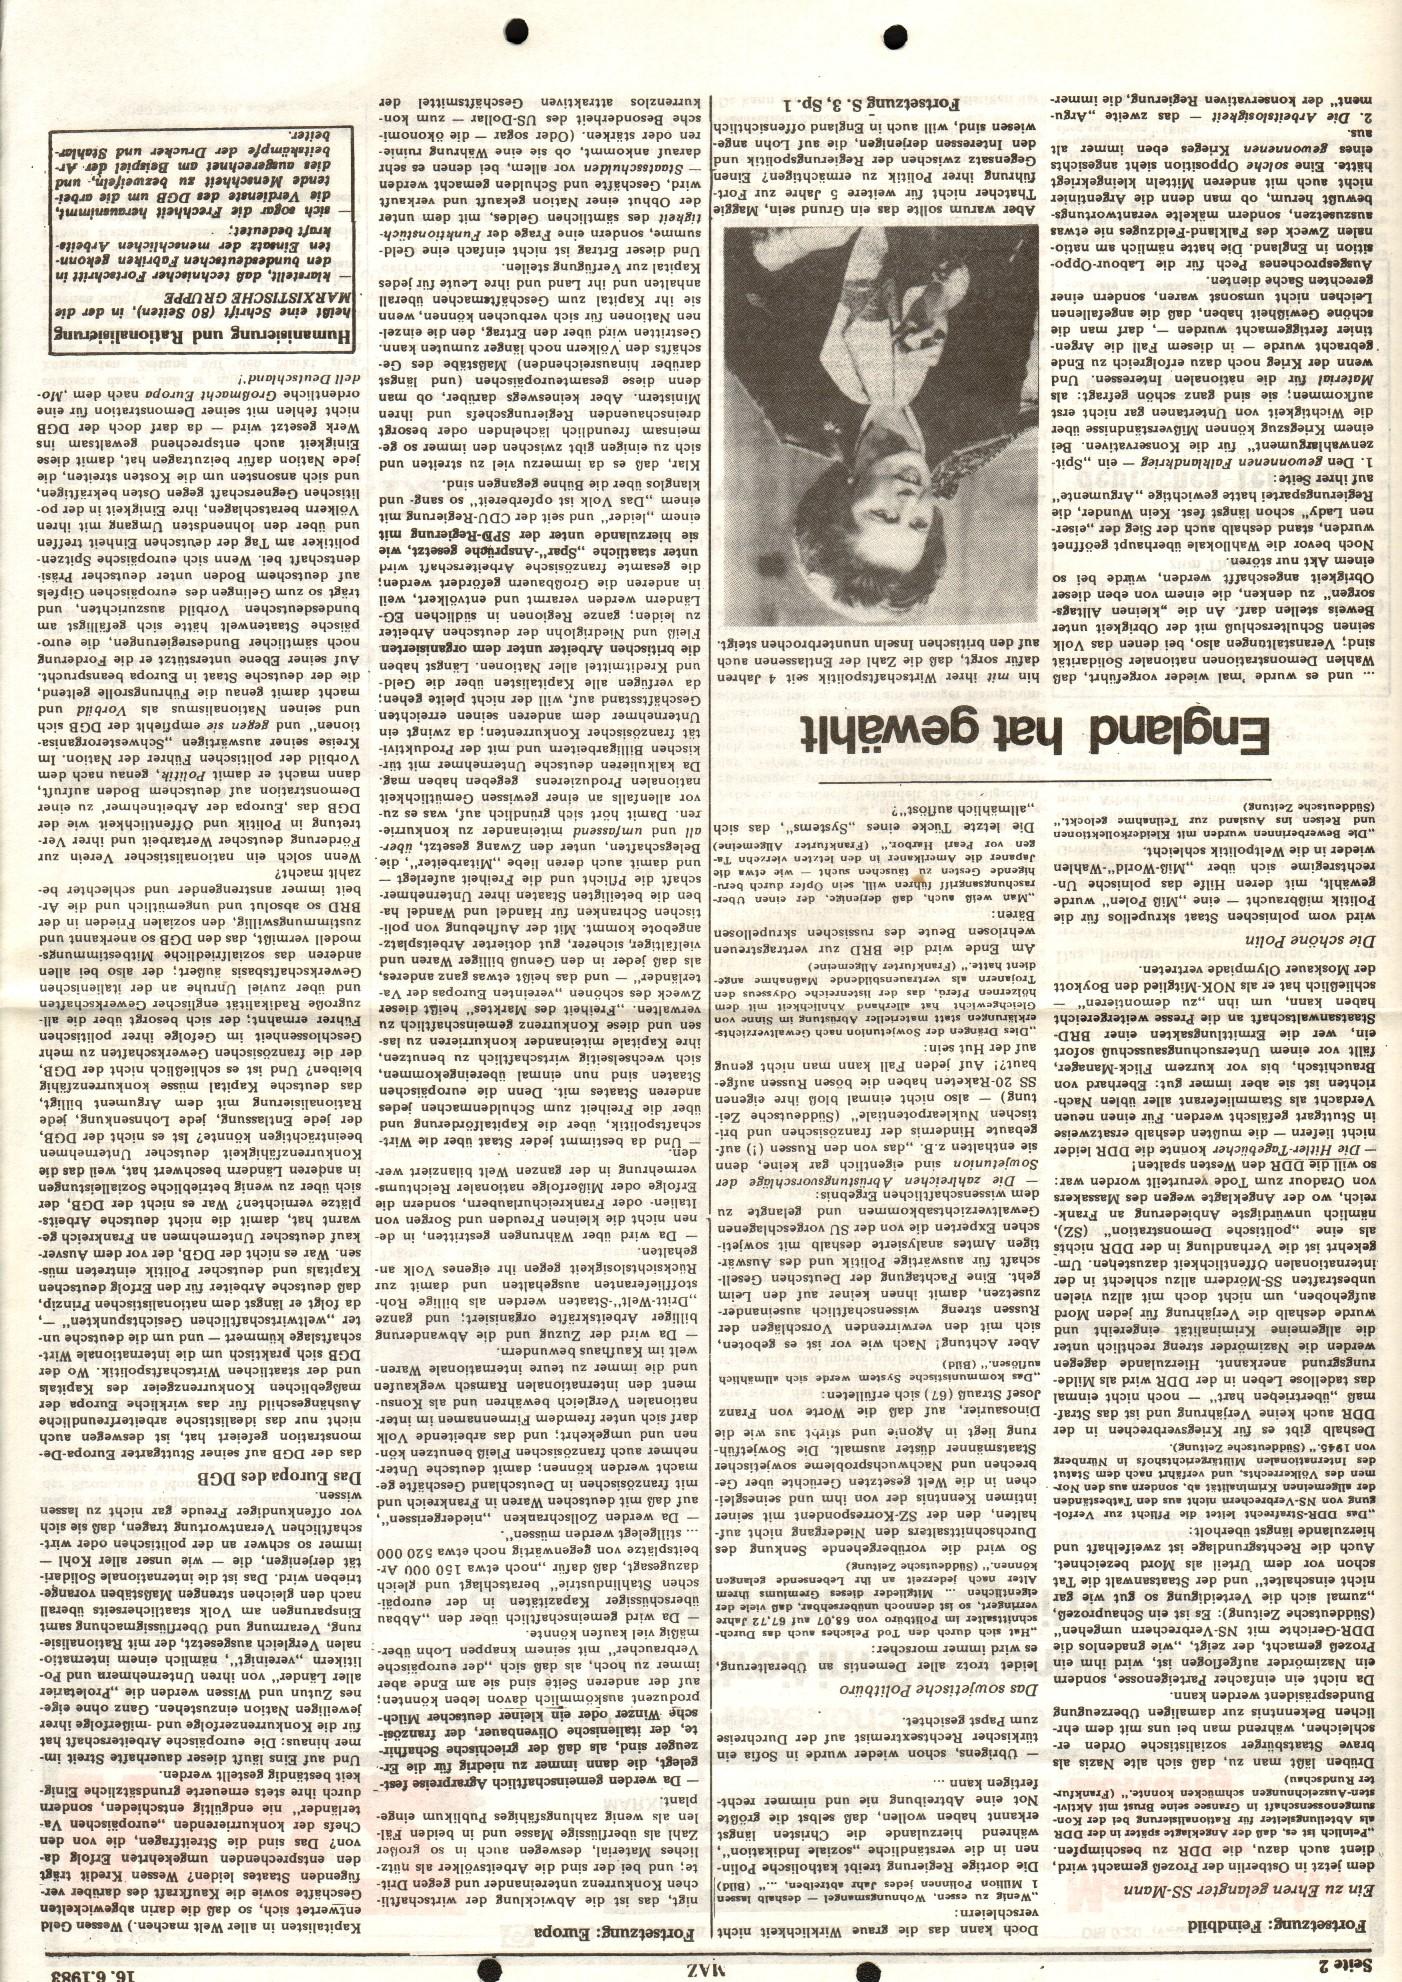 Hamburg_MG_MAZ_Druck_19830616_02